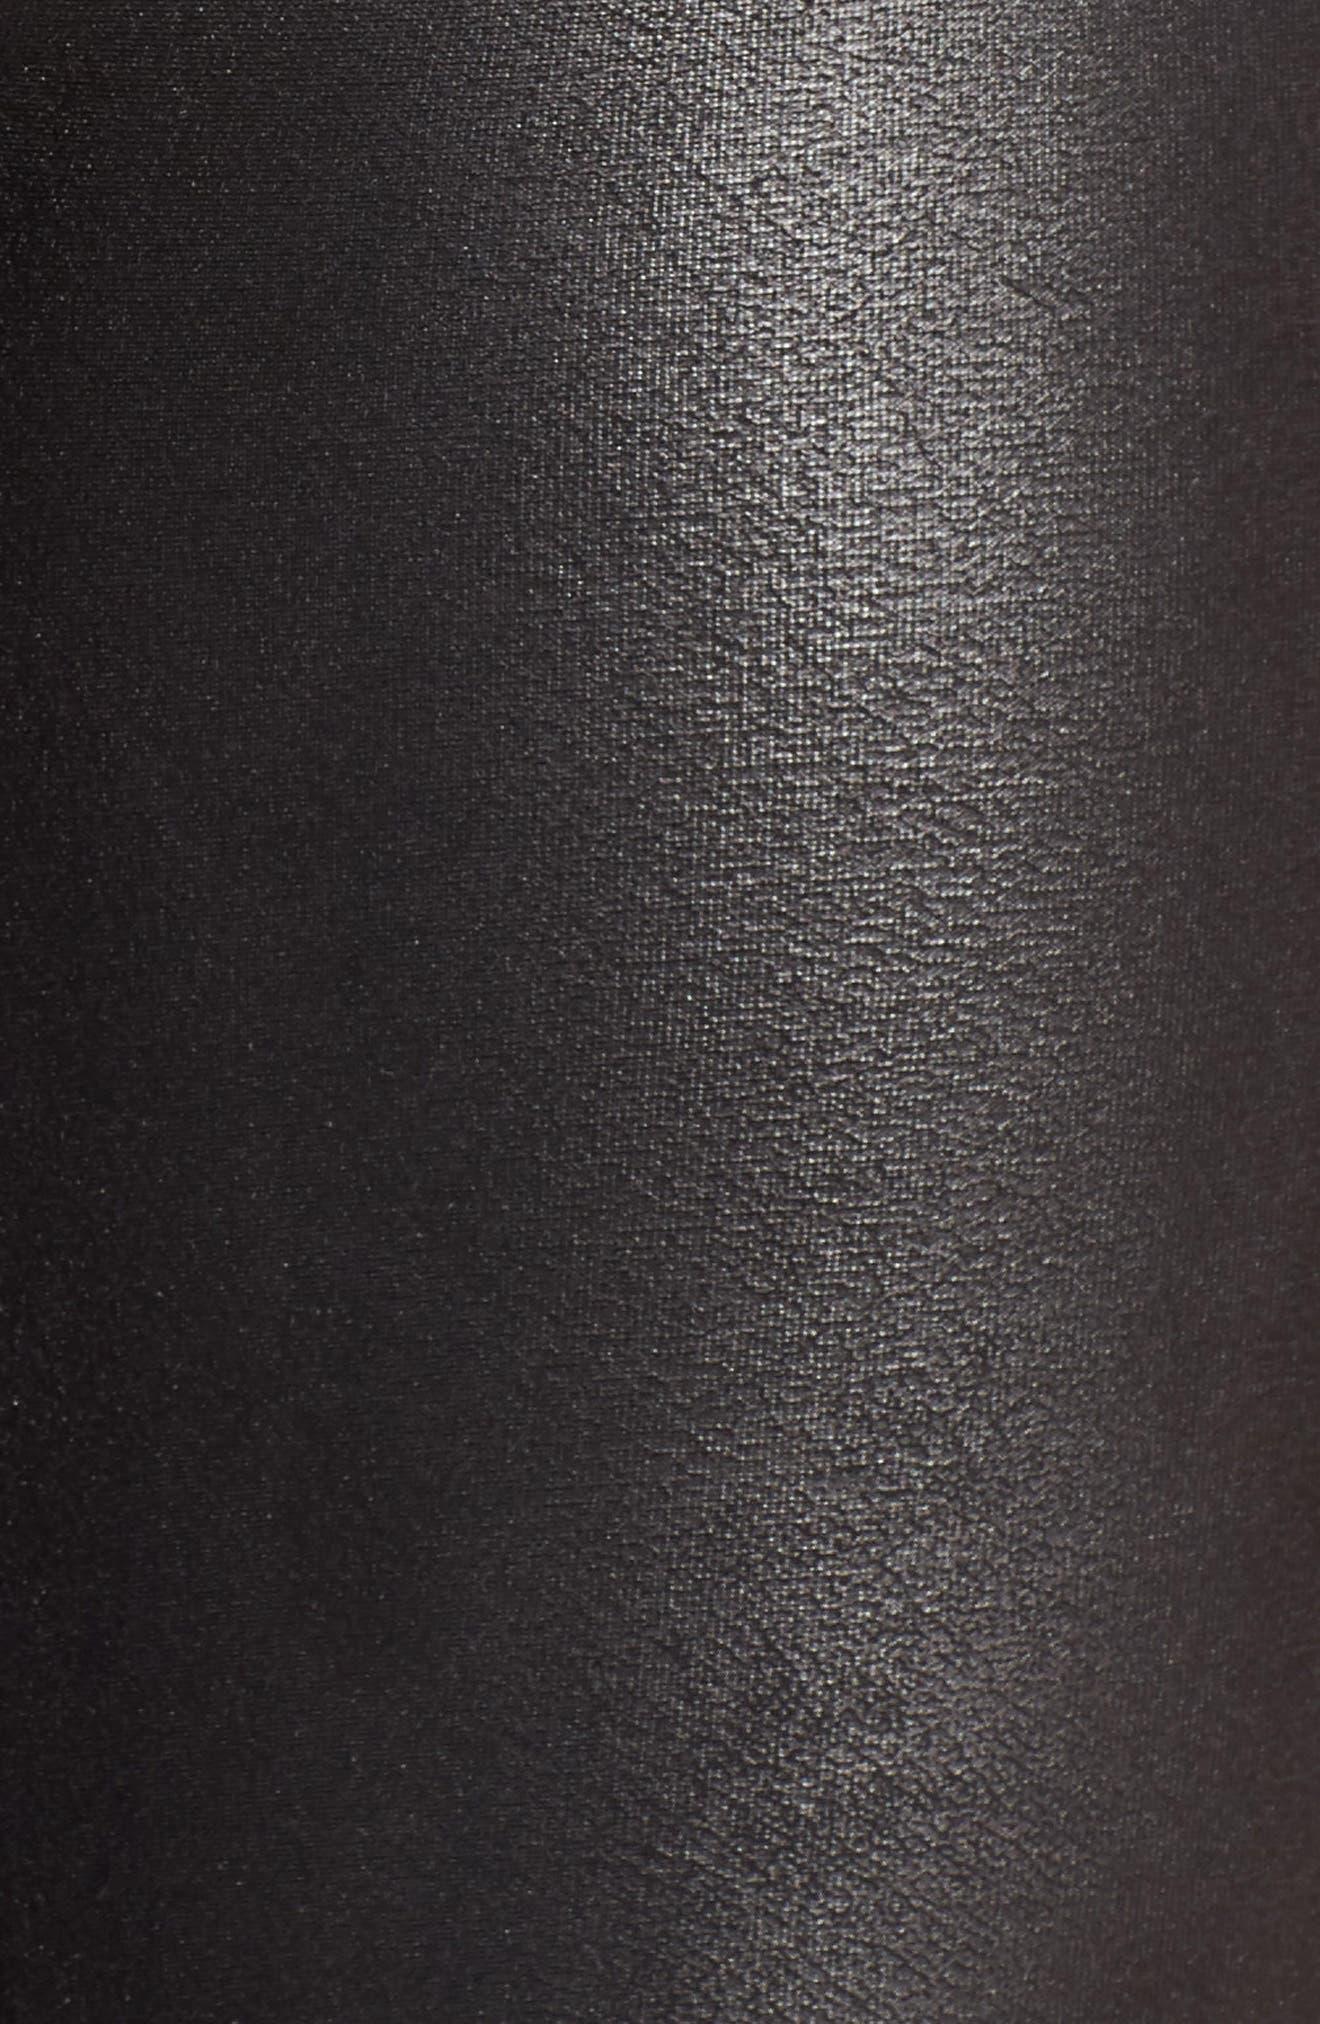 Side Stripe Faux Leather Leggings,                             Alternate thumbnail 5, color,                             VERY BLACK/ WHT